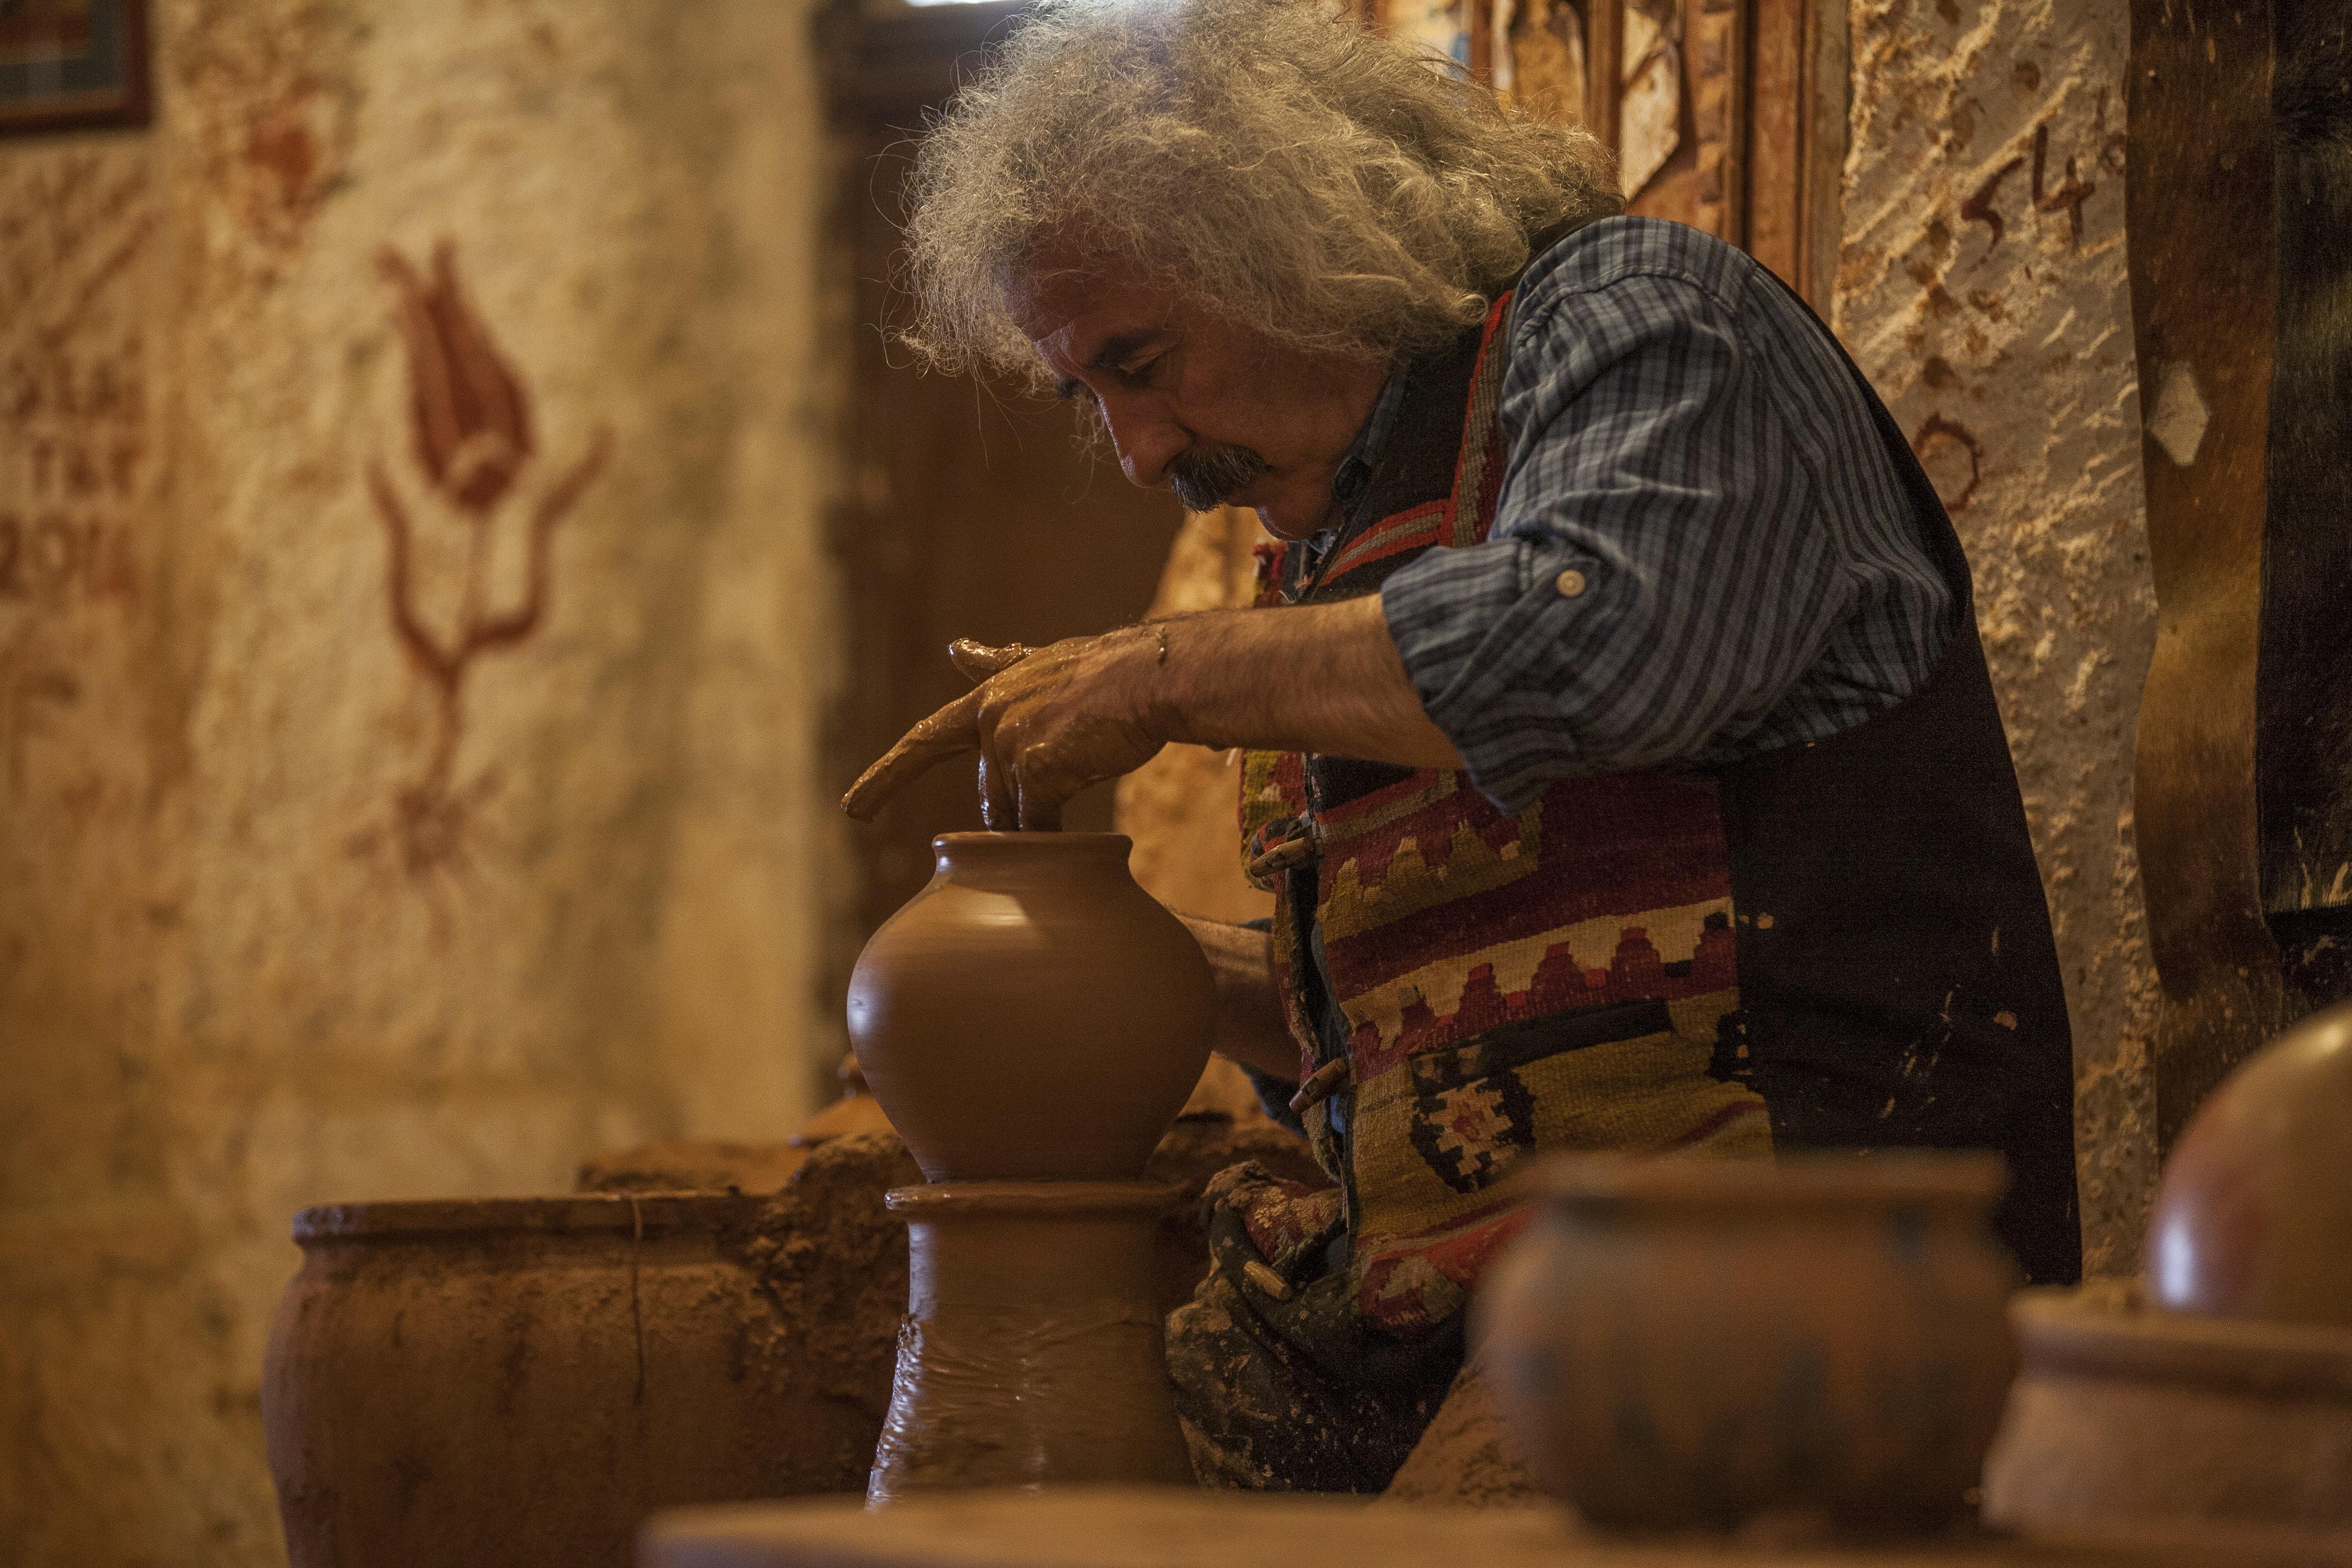 man making pot near wall in house